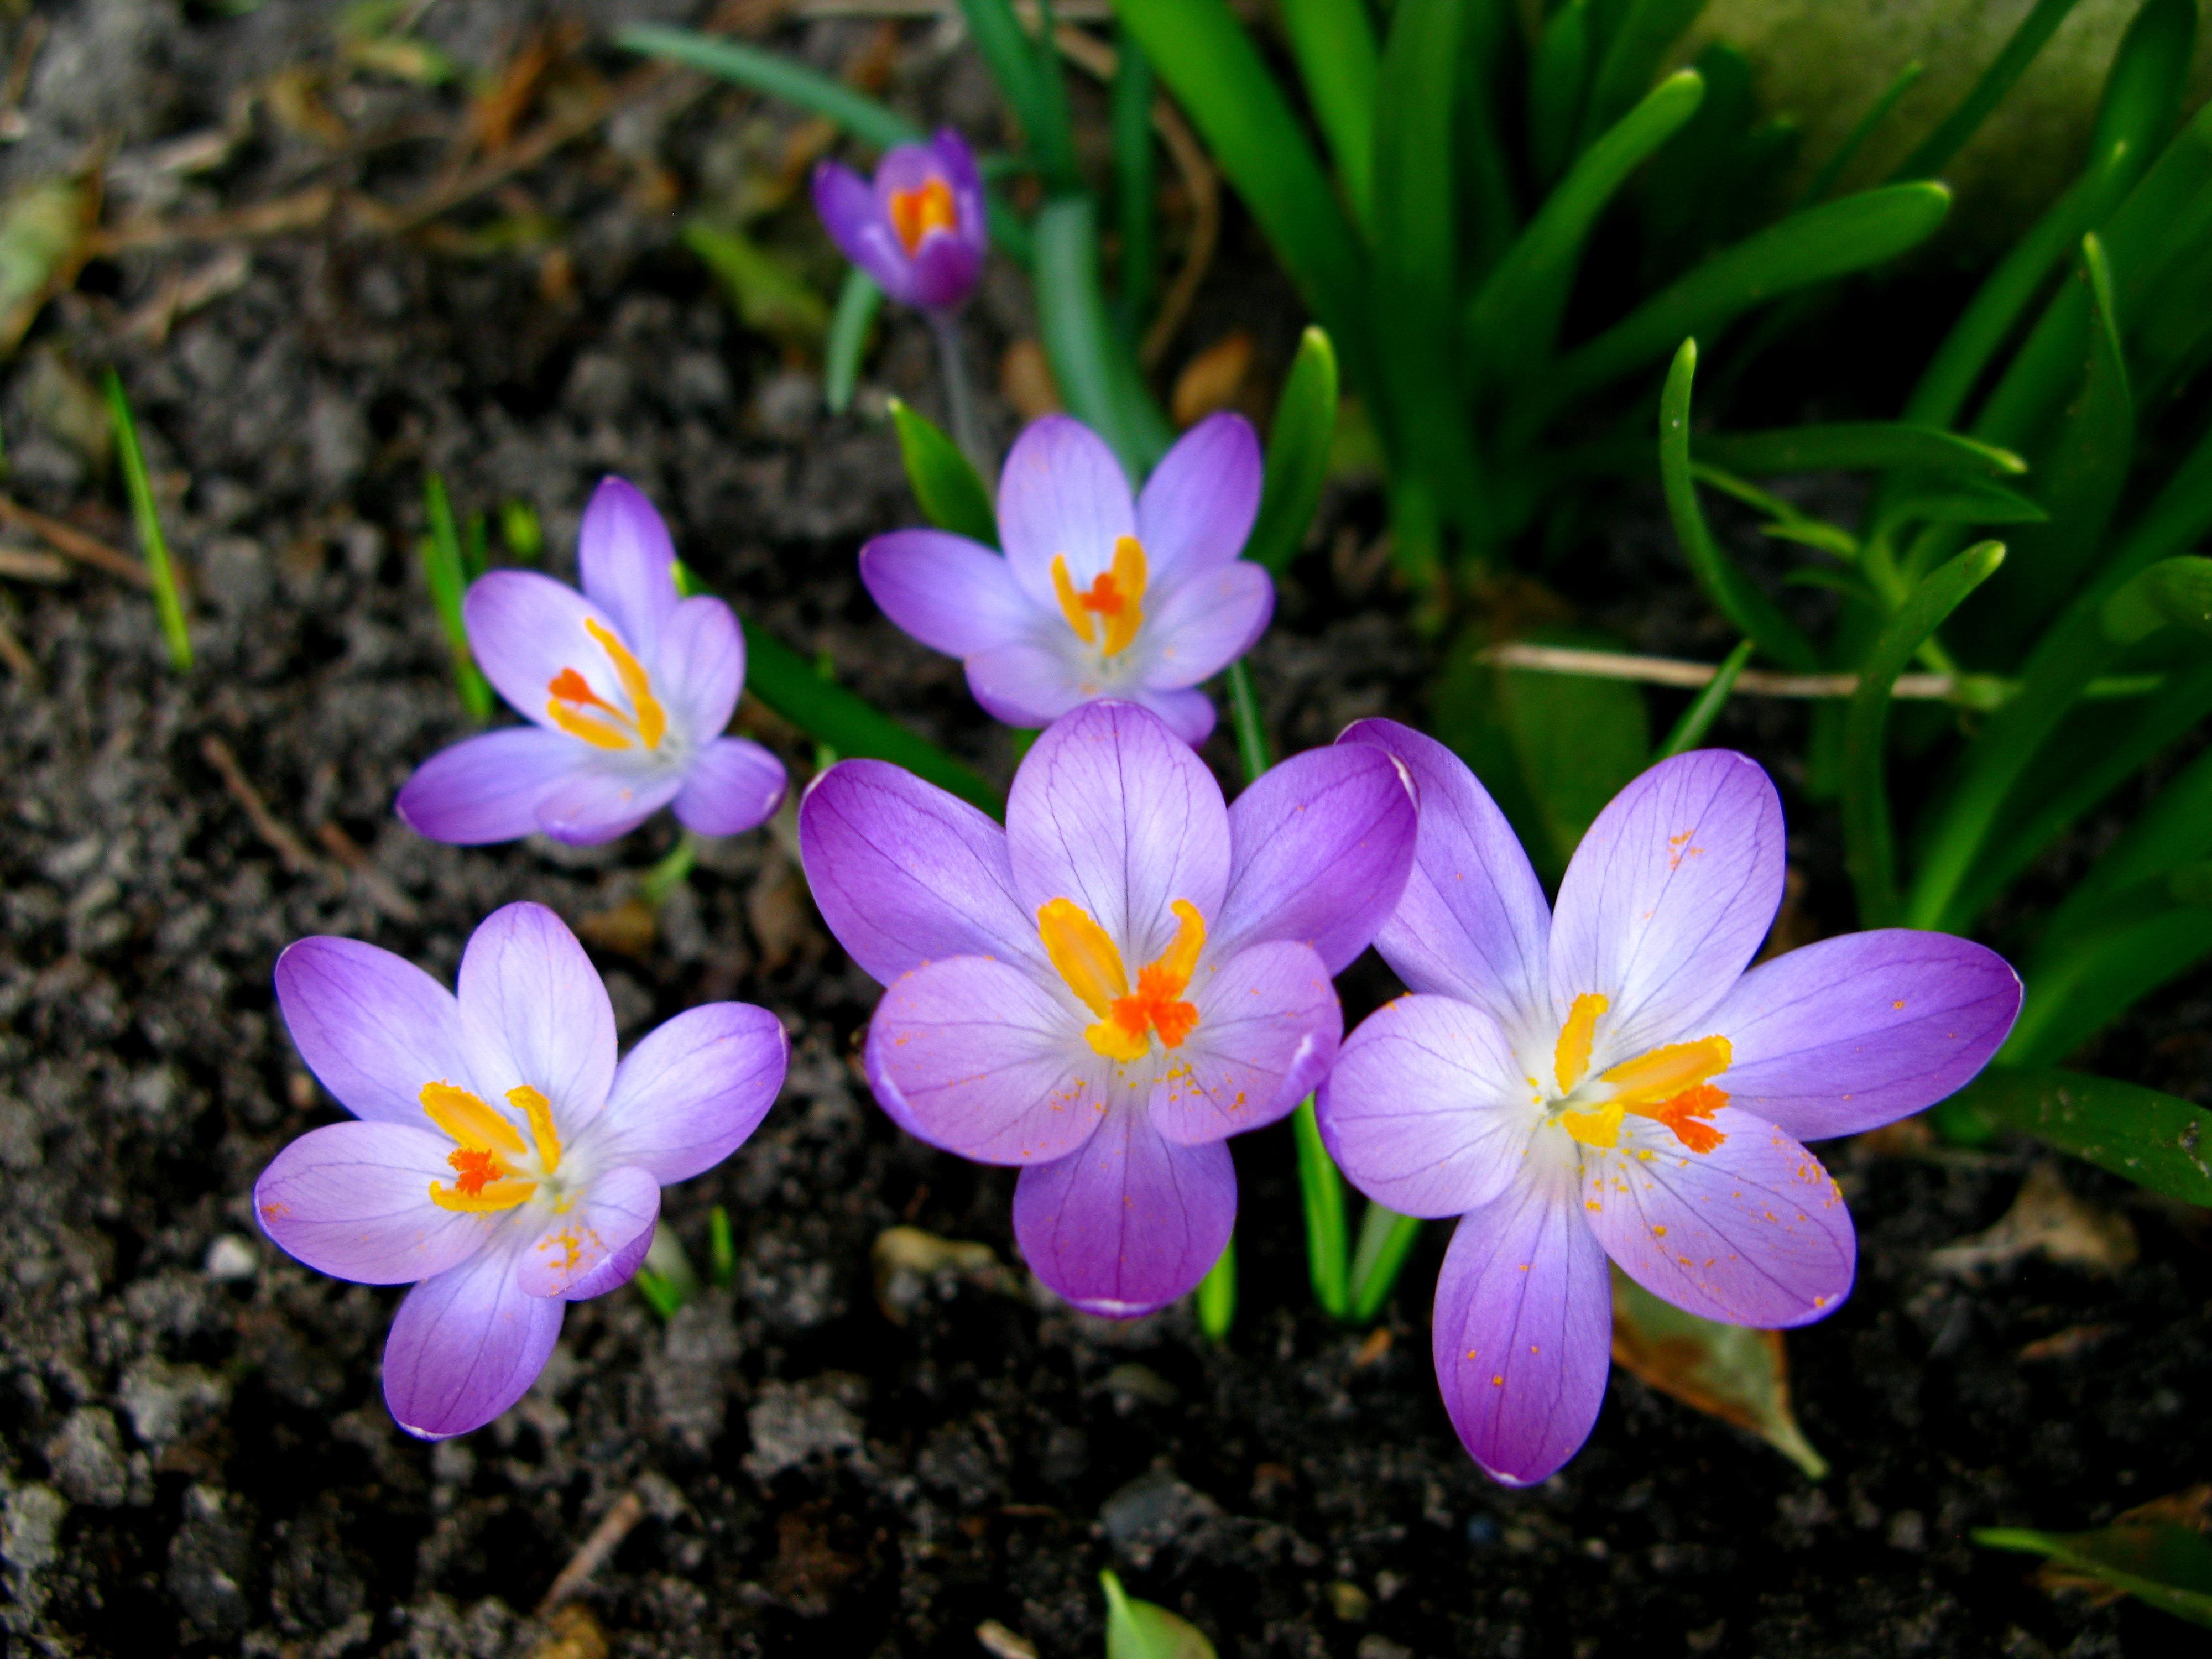 Цветочки весенние картинки ирисов всегда